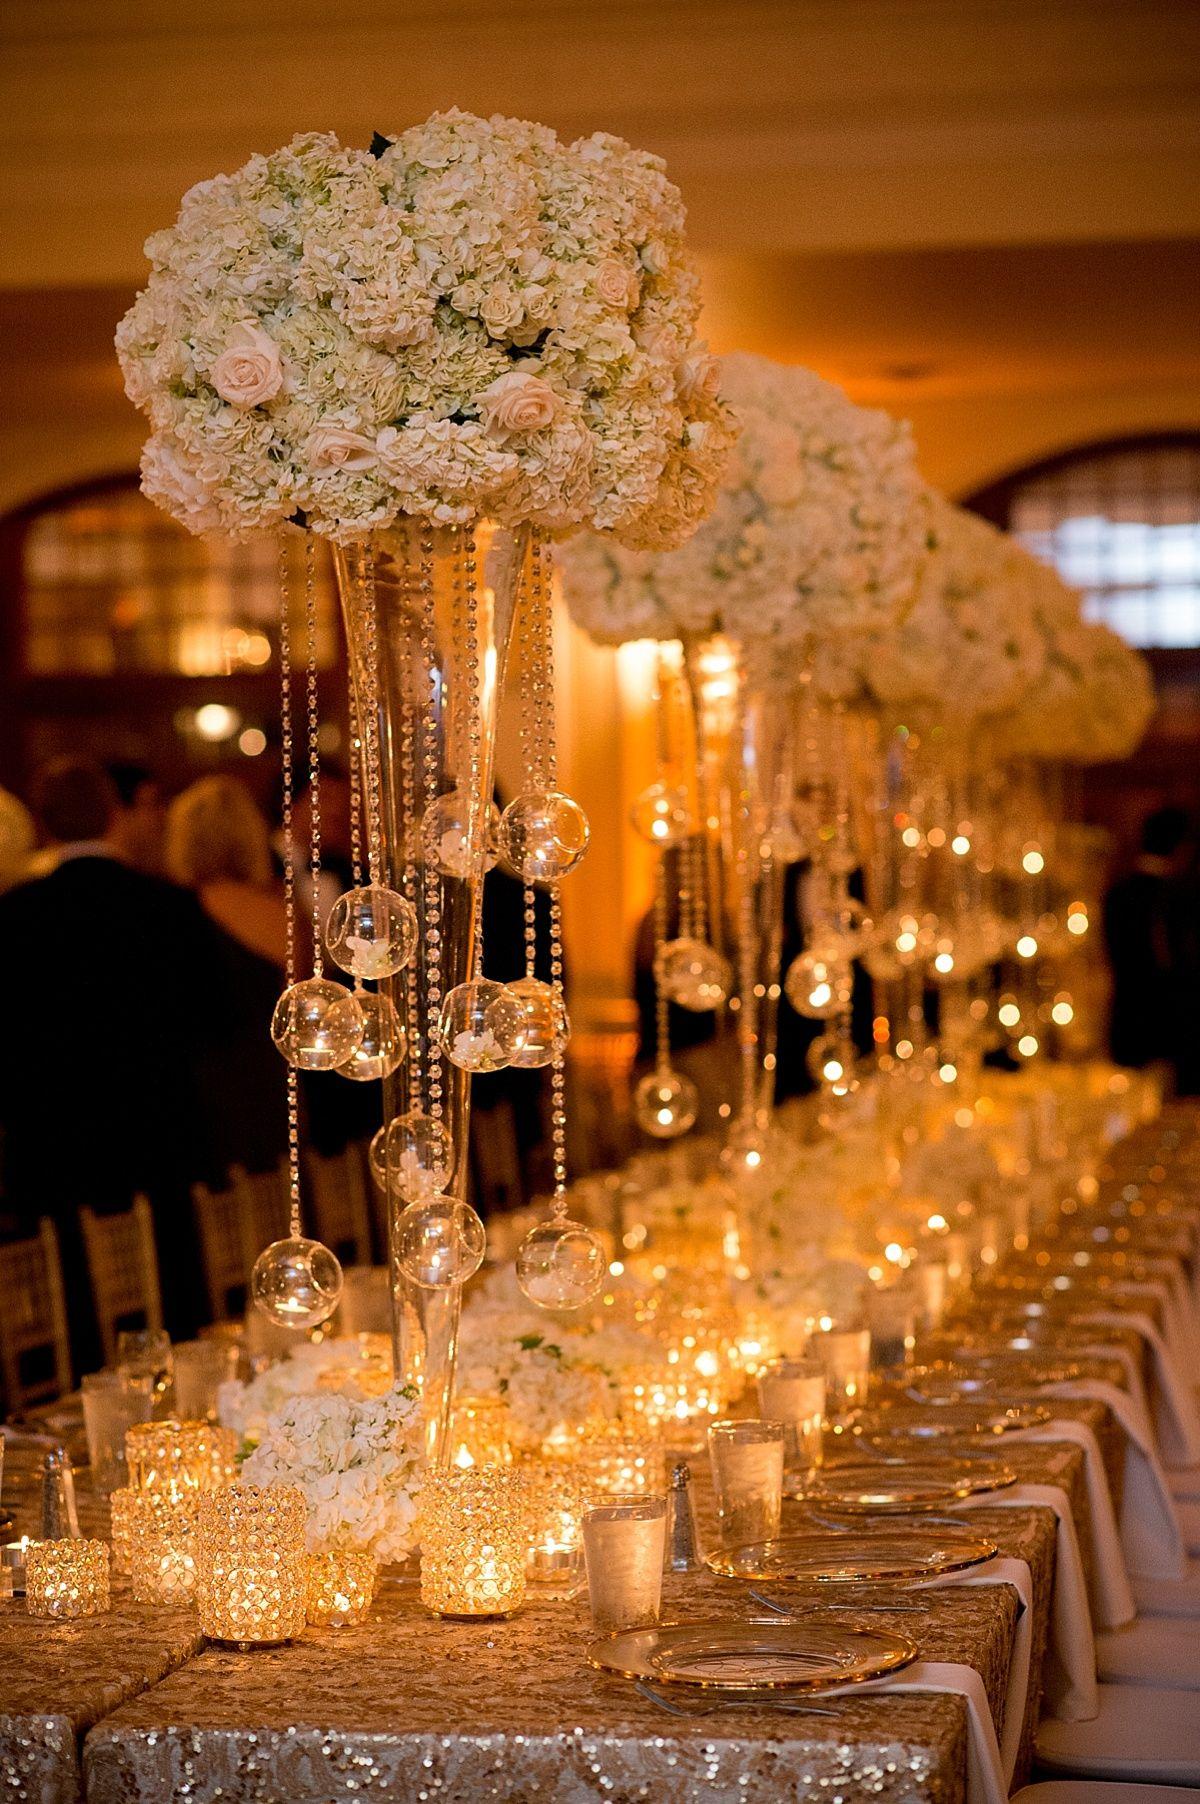 Weddings In Houston Weddings In Houston Beautiful Wedding Decorations Wedding Centerpieces Wedding Floral Centerpieces